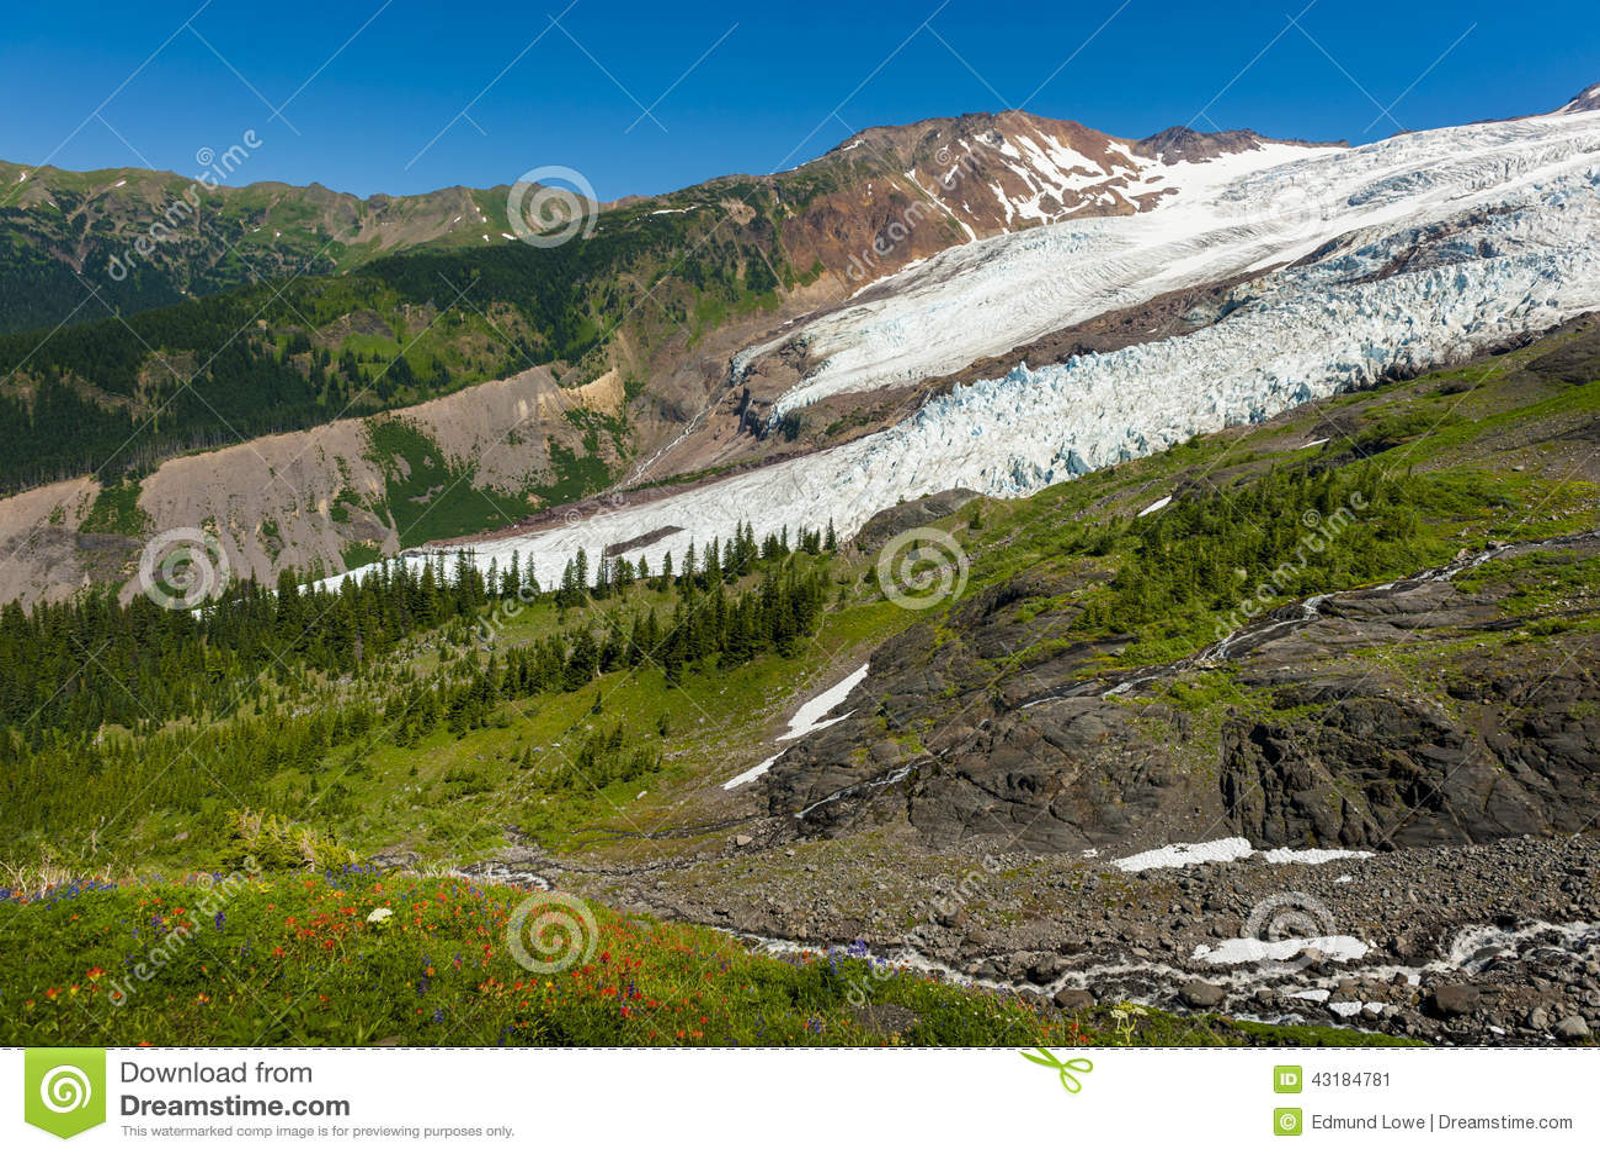 Mt. Baker and the Coleman Glacier